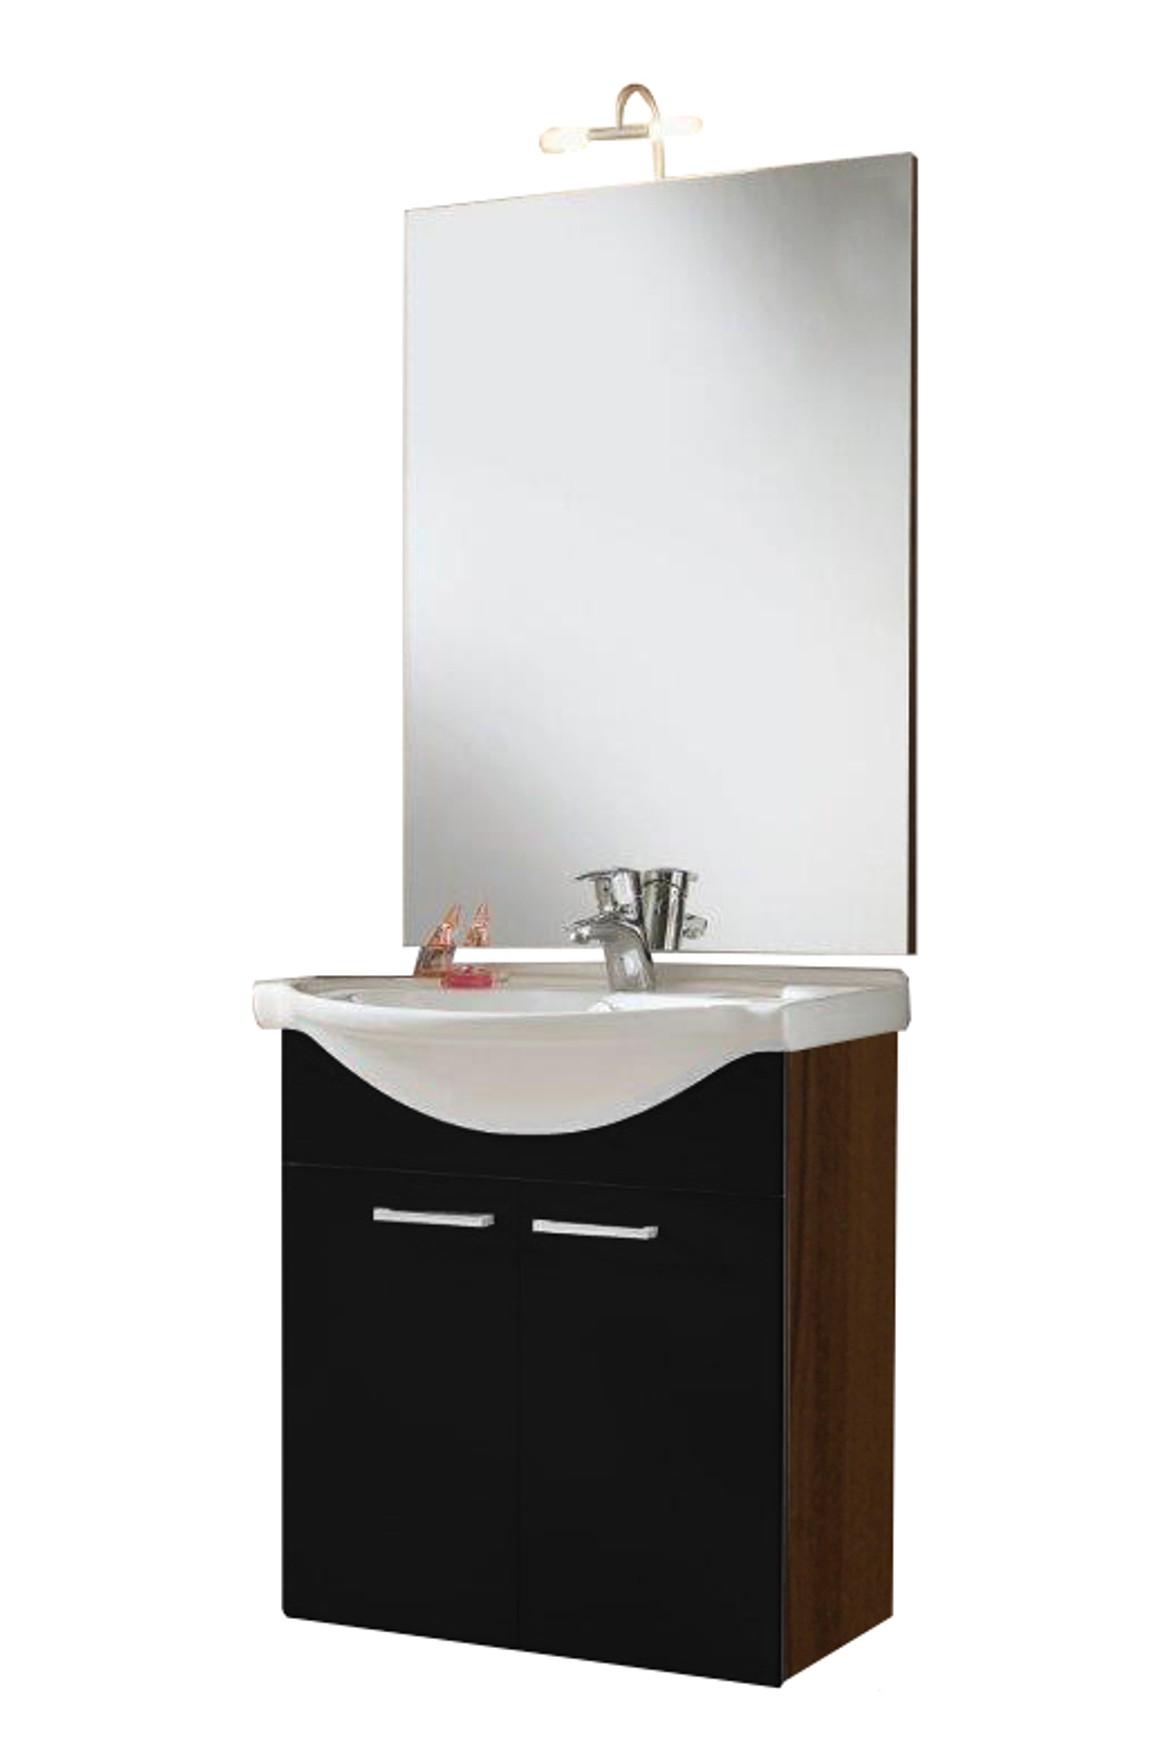 badm bel set adelano mit waschplatz 7 teilig 127 cm breit schwarz bad badm belsets. Black Bedroom Furniture Sets. Home Design Ideas